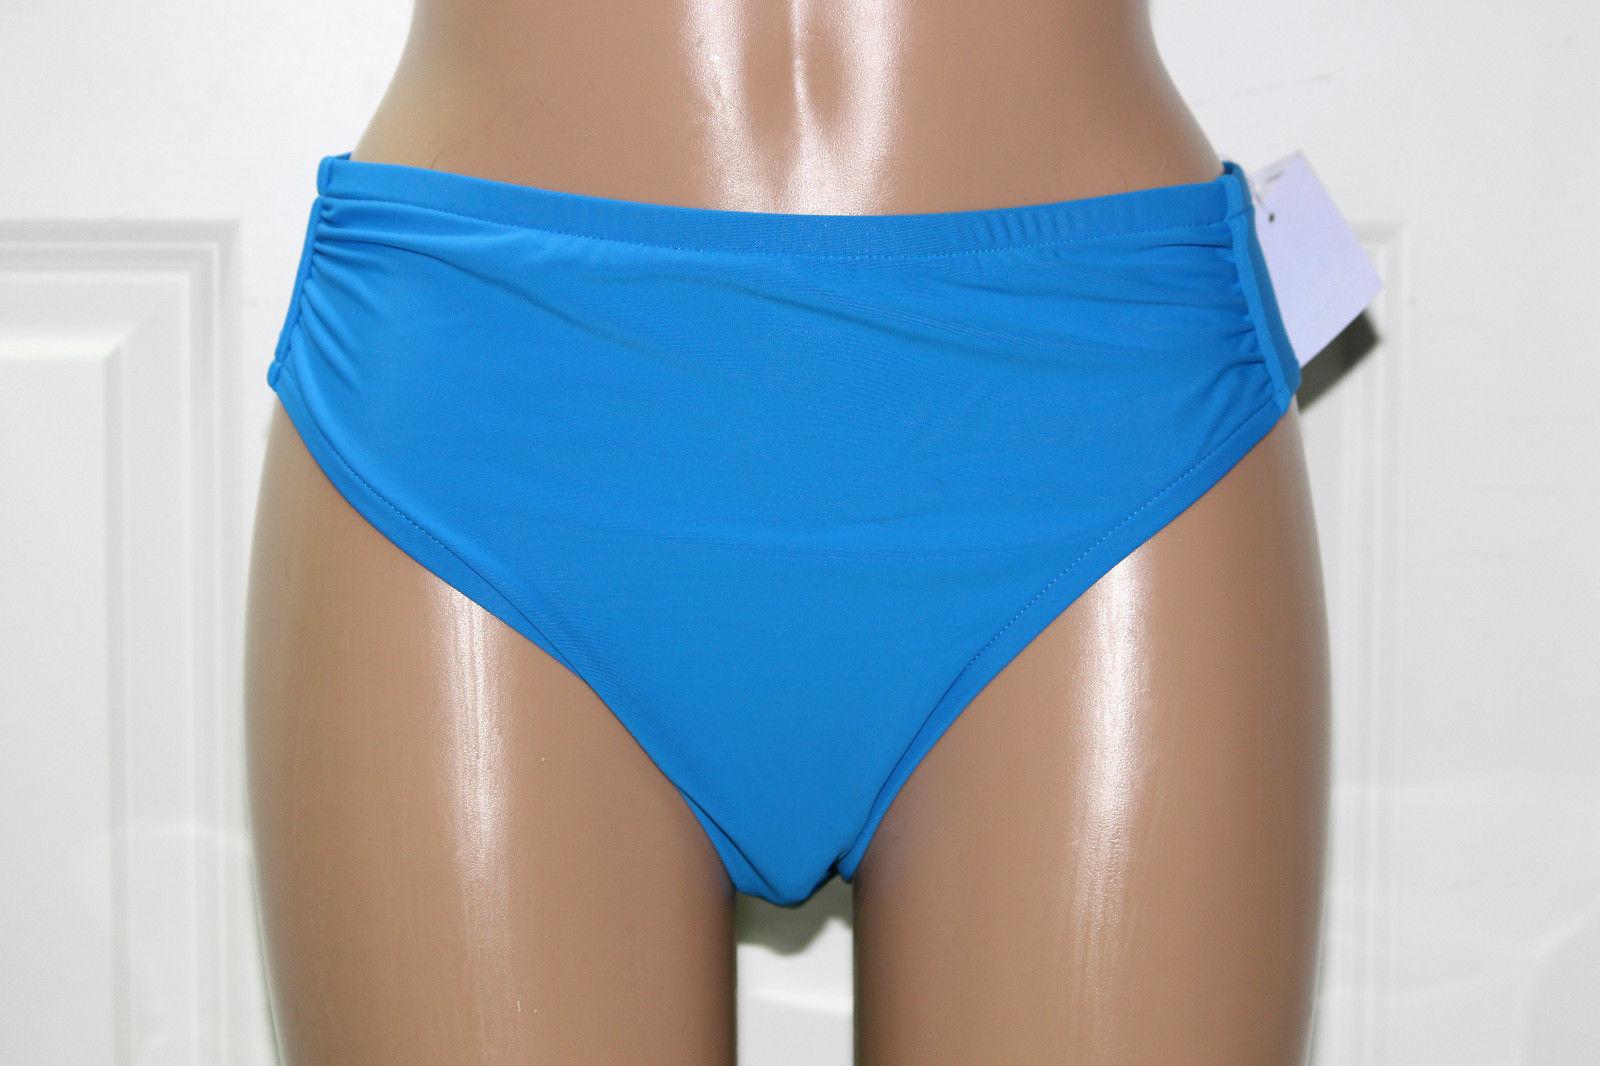 NEW INC International Concepts Solid Blue BLU Swim Bikini Bottom sz 10 #470427 - $6.23